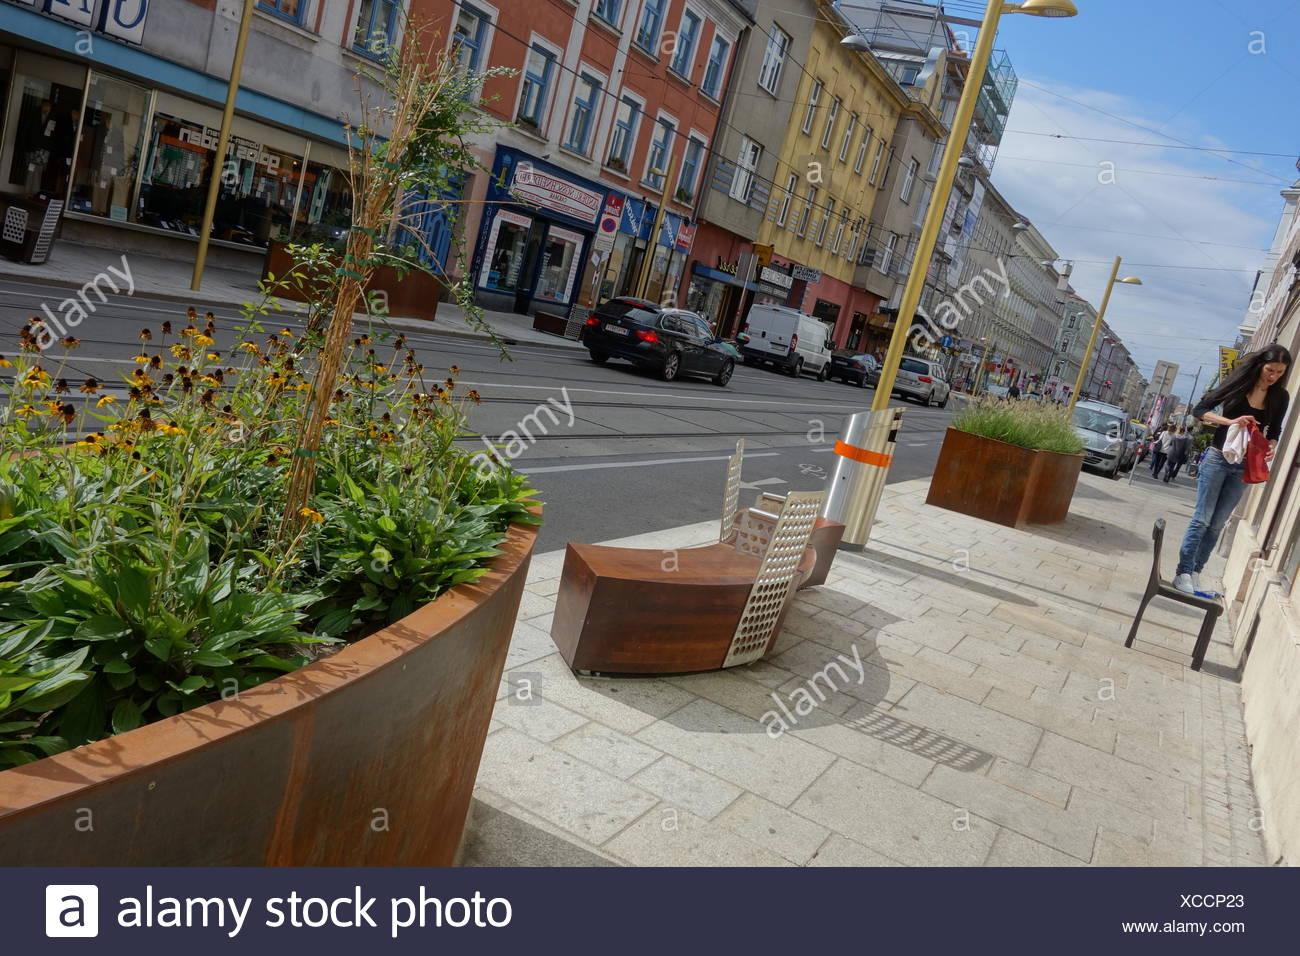 Wien, neugestaltete Ottakringerstrasse - Stock Image